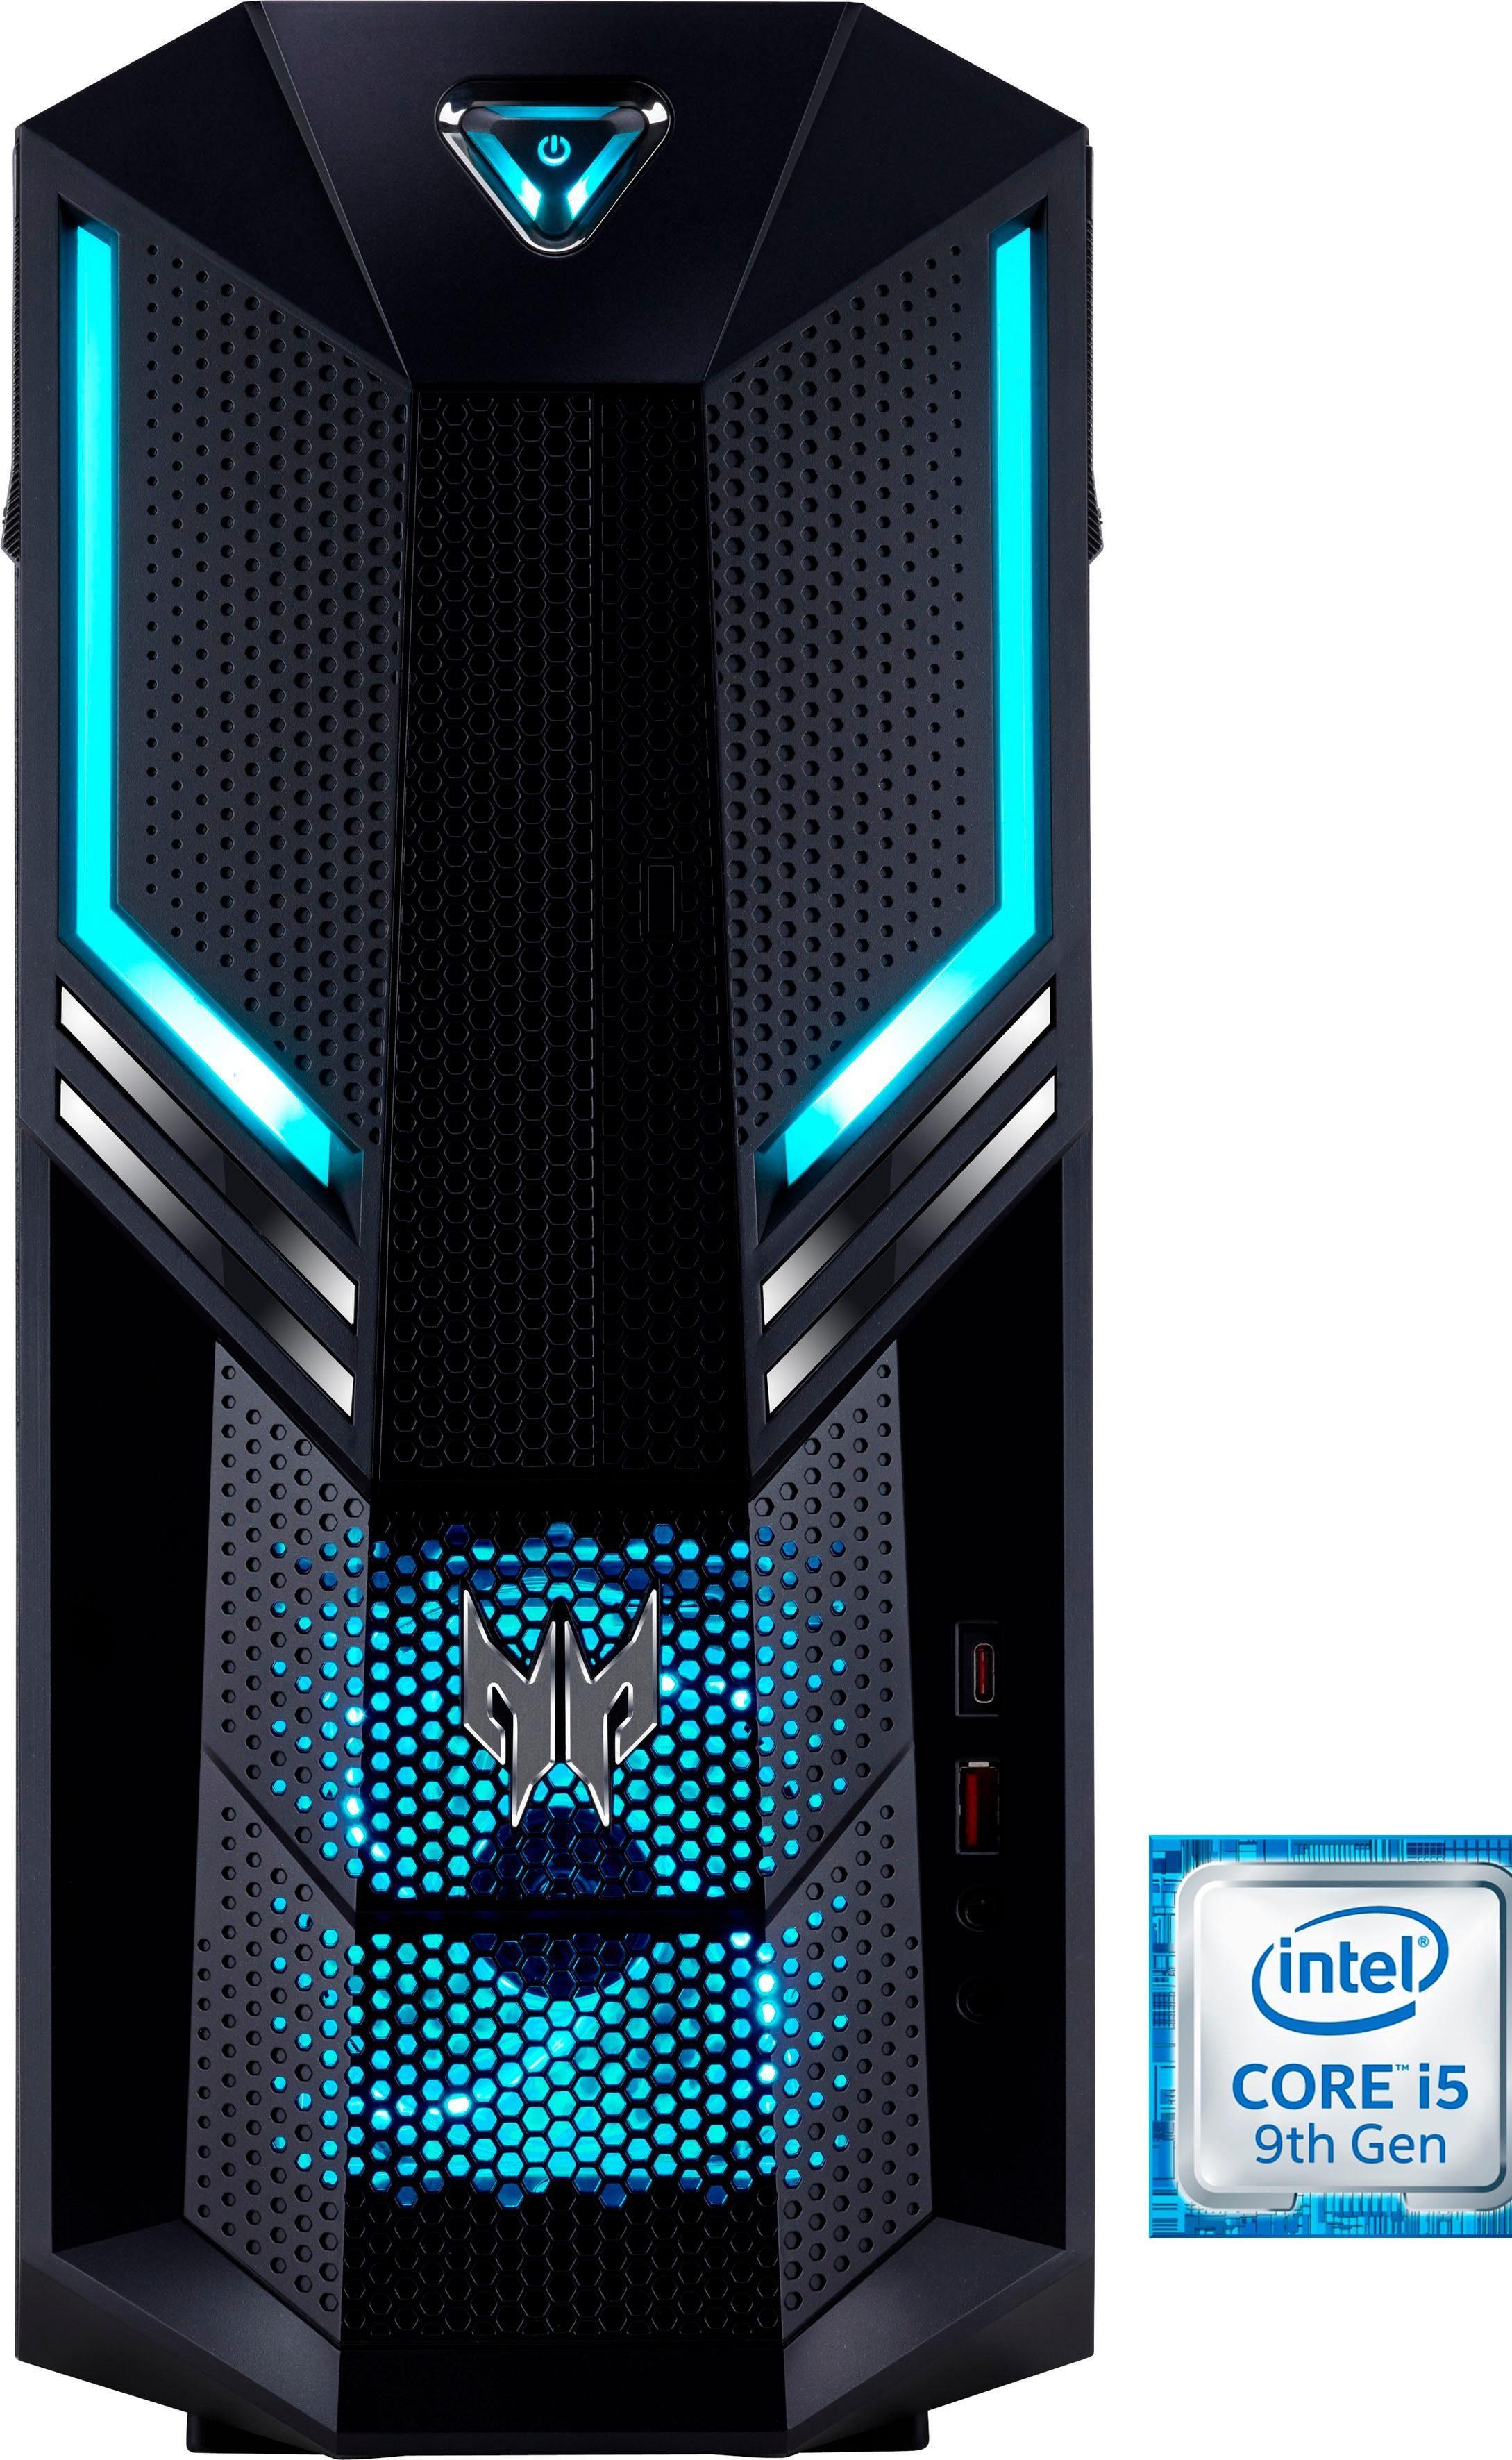 Acer Predator Orion 3000 (PO3-600) Gaming-PC (Intel Core i5, GTX 1050 Ti, 8 GB RAM, 1000 GB HDD, 128 GB SSD, Luftkühlung)